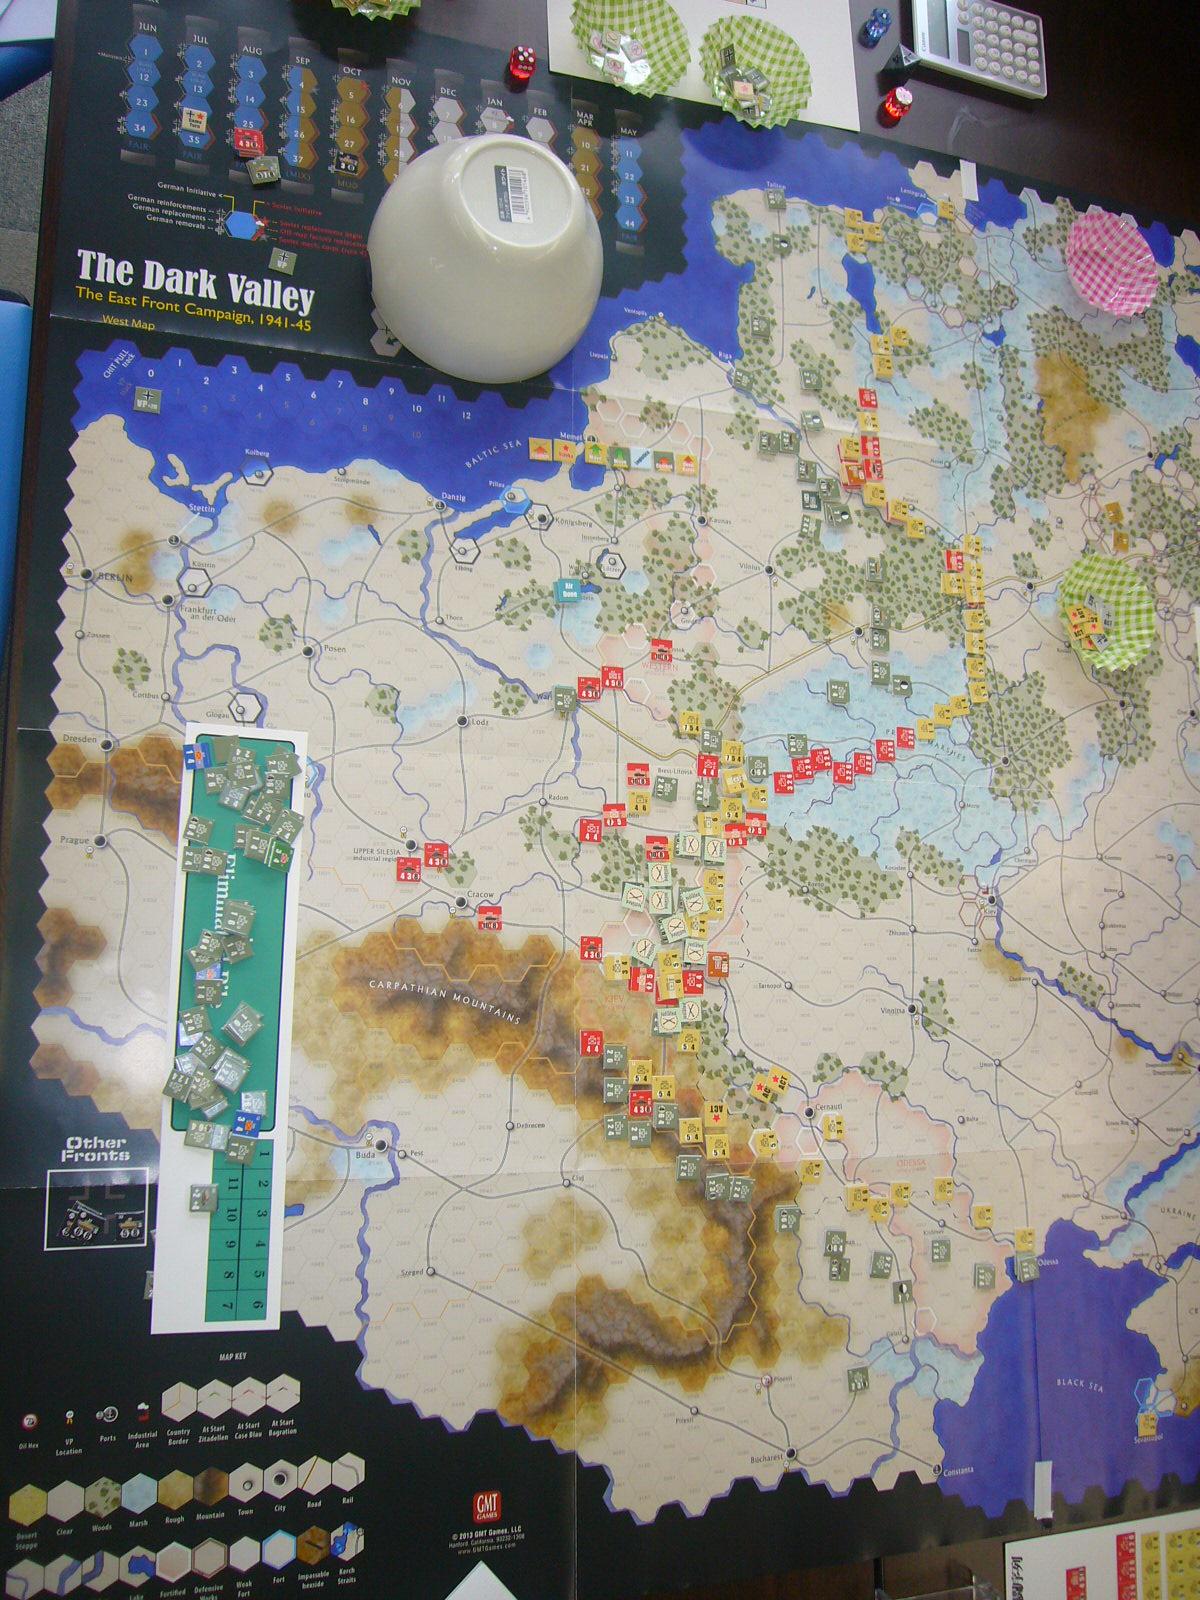 6/21 YSGA第300回定例会の様子その3(GMT)ダーク・バレー「1944バグラチオン作戦」シナリオ3人戦)_b0173672_23035311.jpg